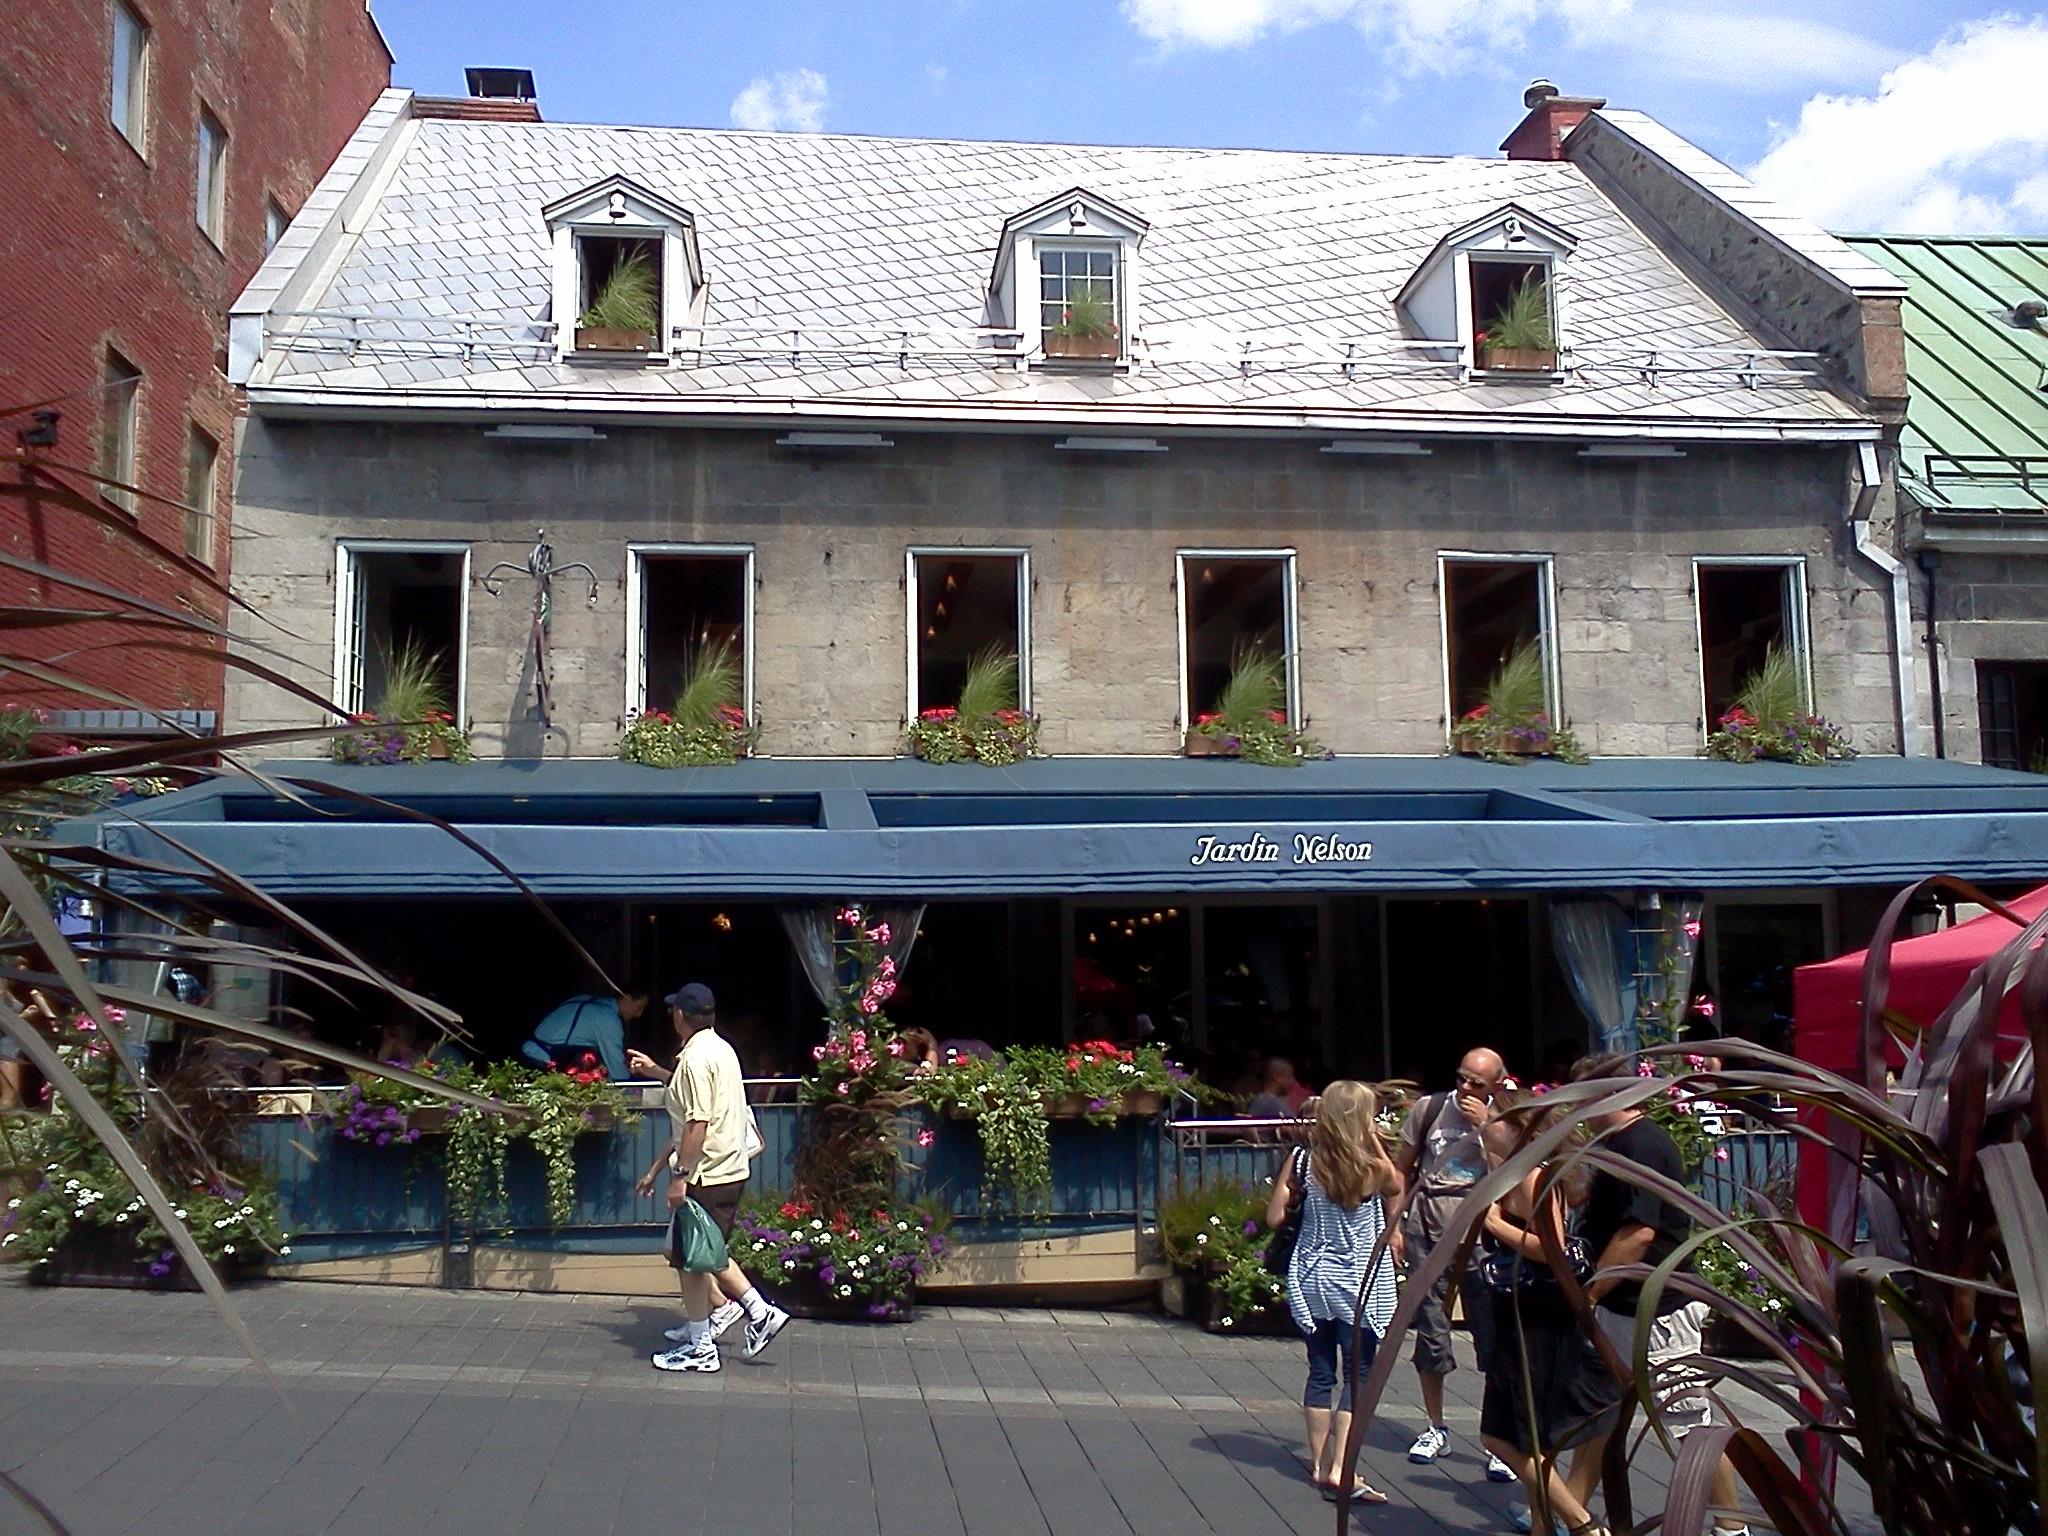 Montreal, Jardin Nelson, August 2011